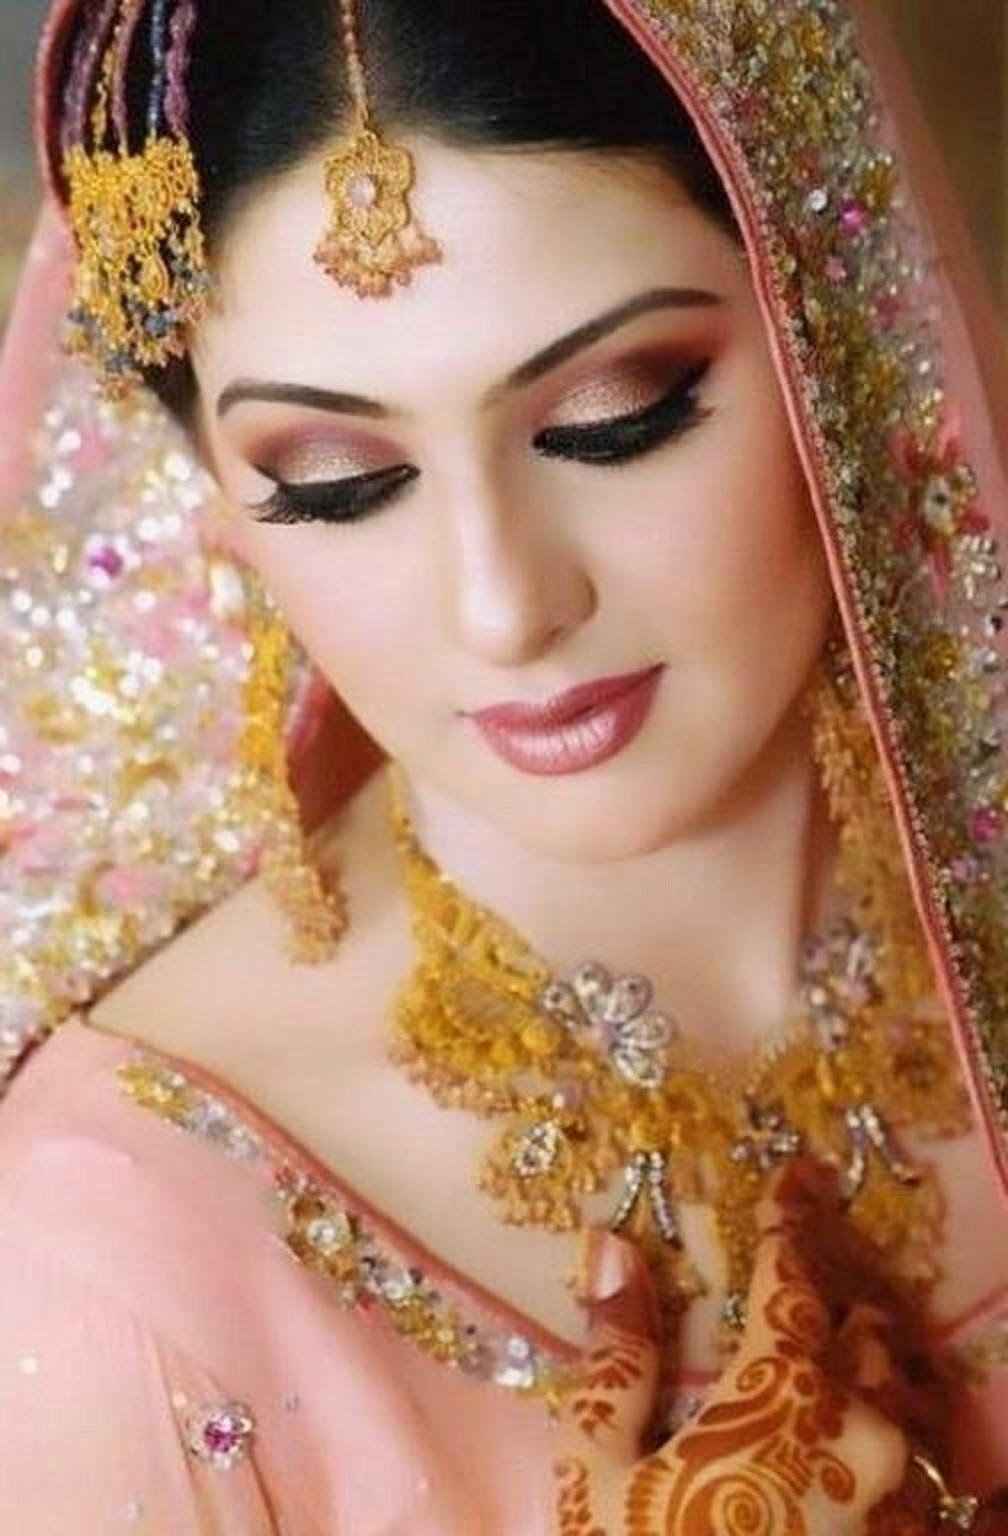 Dulhan Makeup Ideas 2014 For Girls Hd Wallpapers Free Download regarding Indian Bridal Makeup Images Free Download